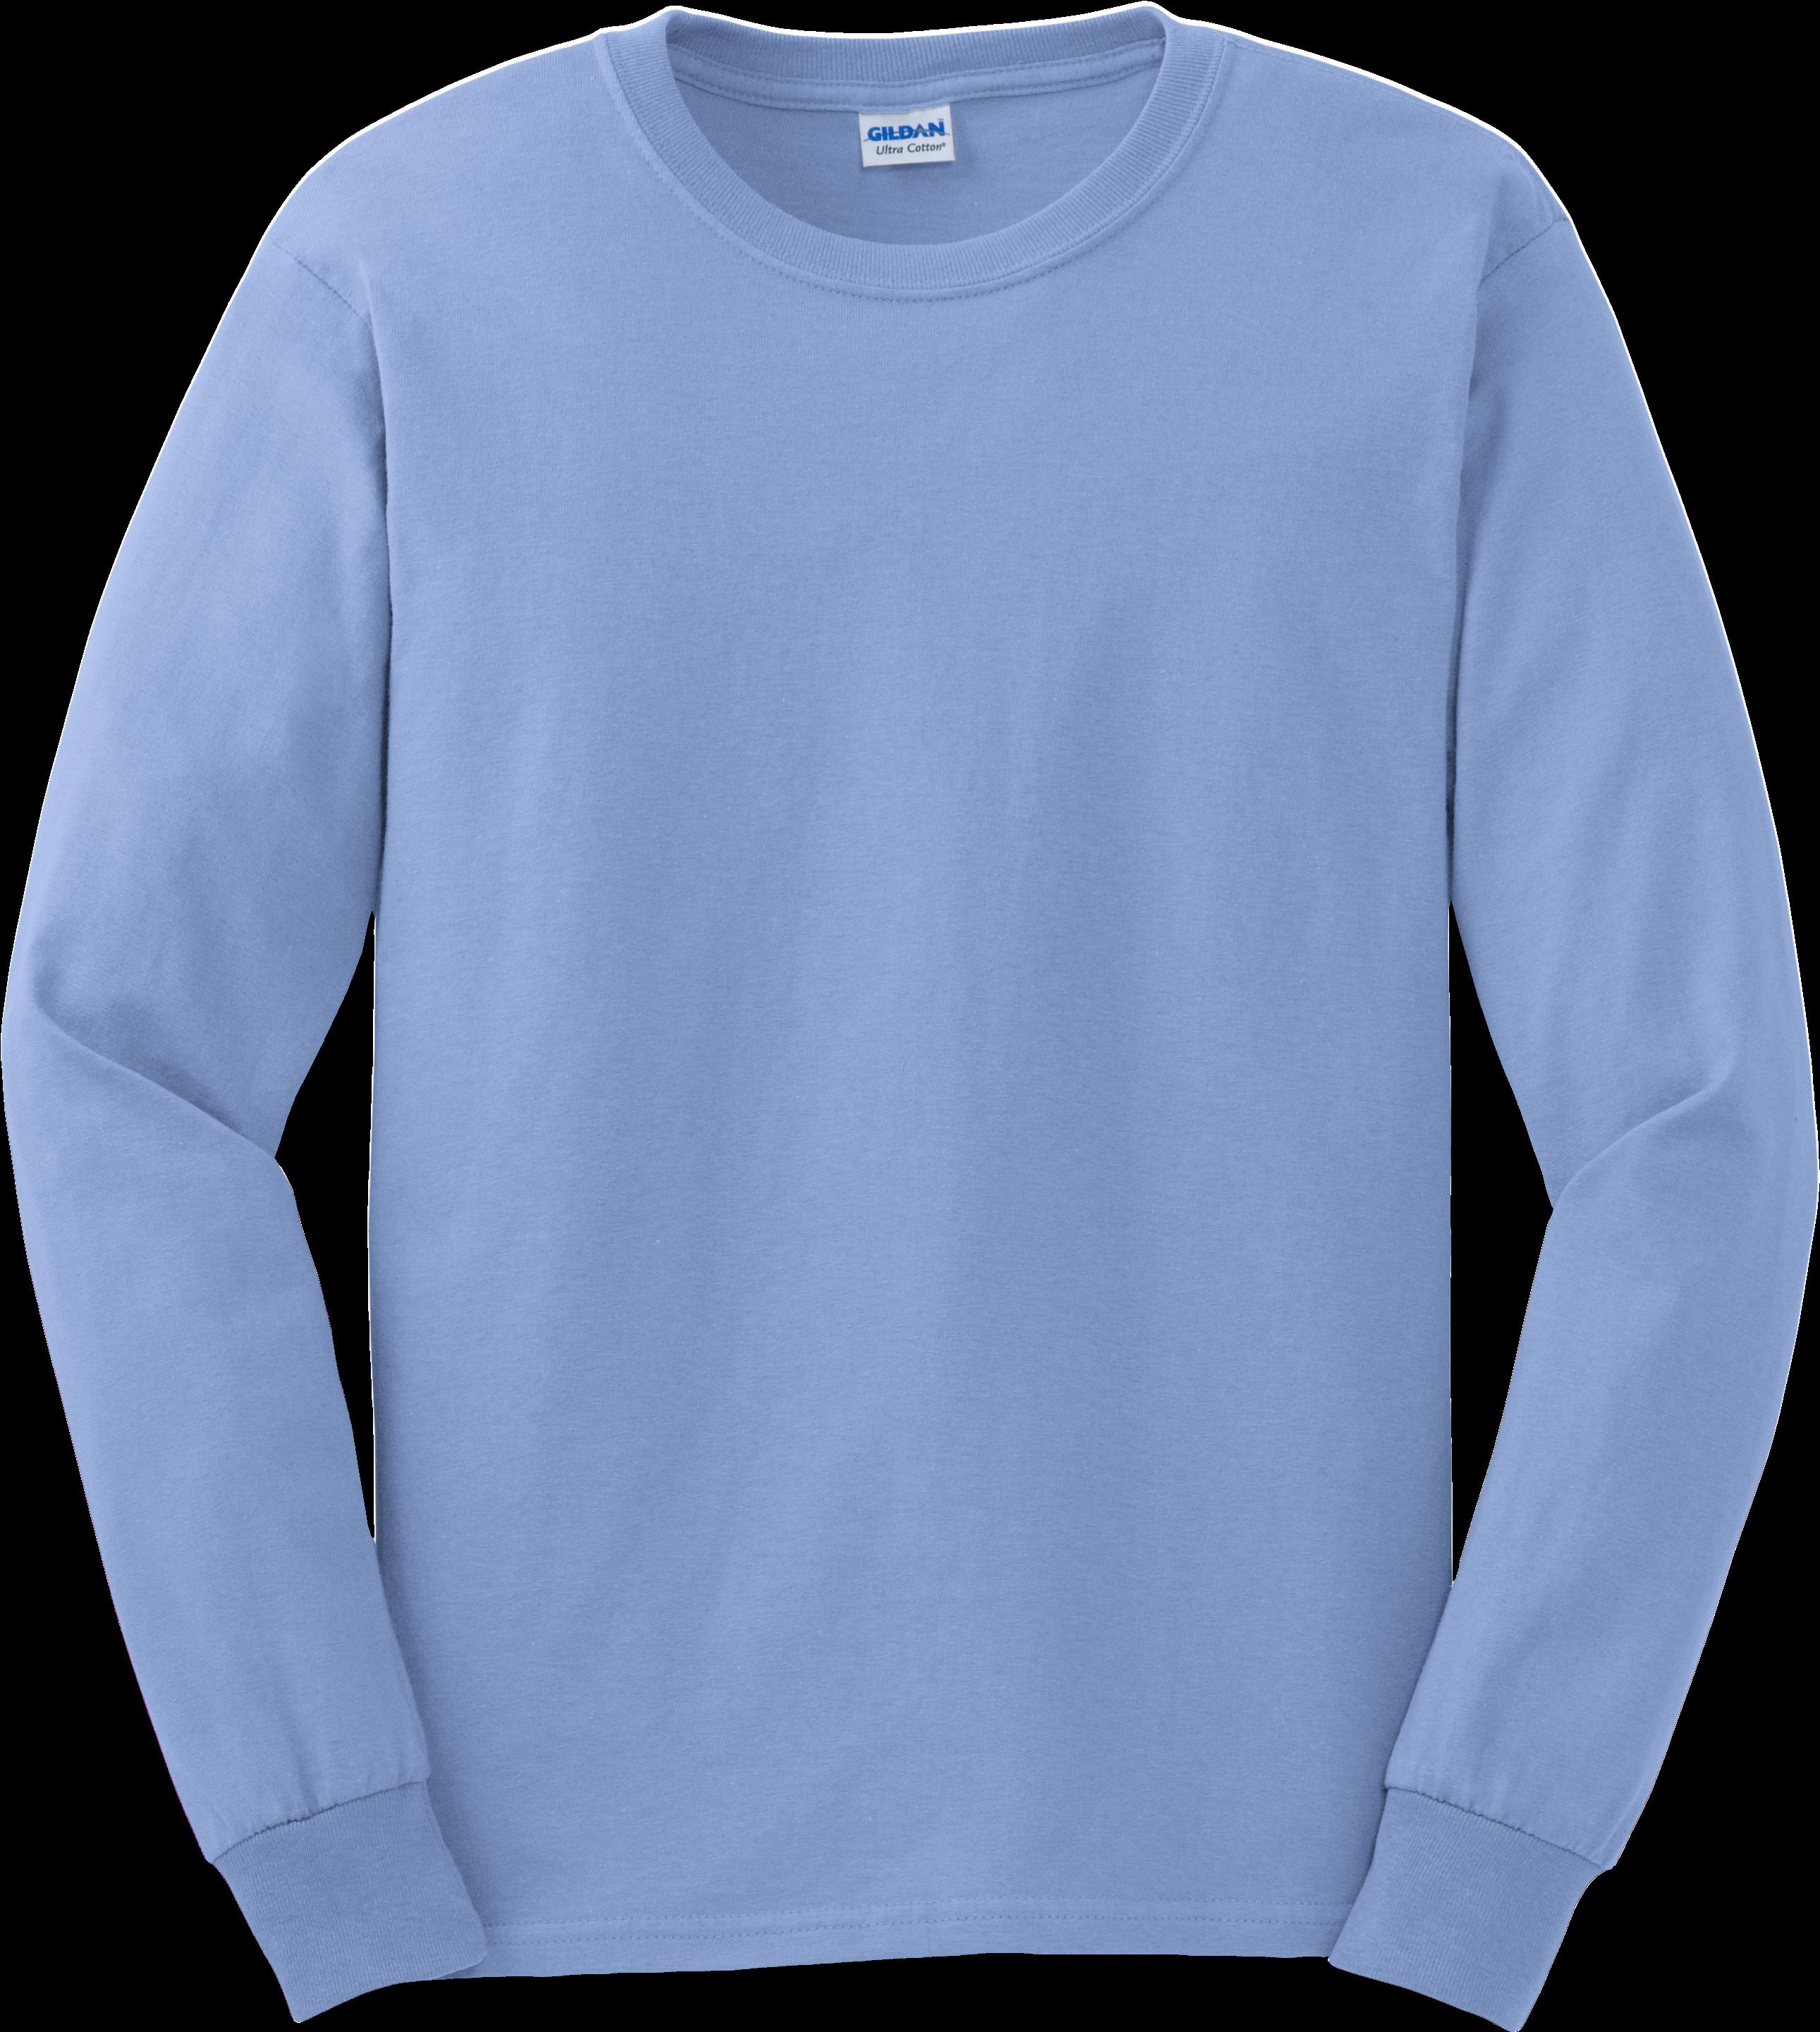 Gildan Long Sleeve T Shirt - Long Sleeve T Shirt Gildan Clipart (3000x3000), Png Download